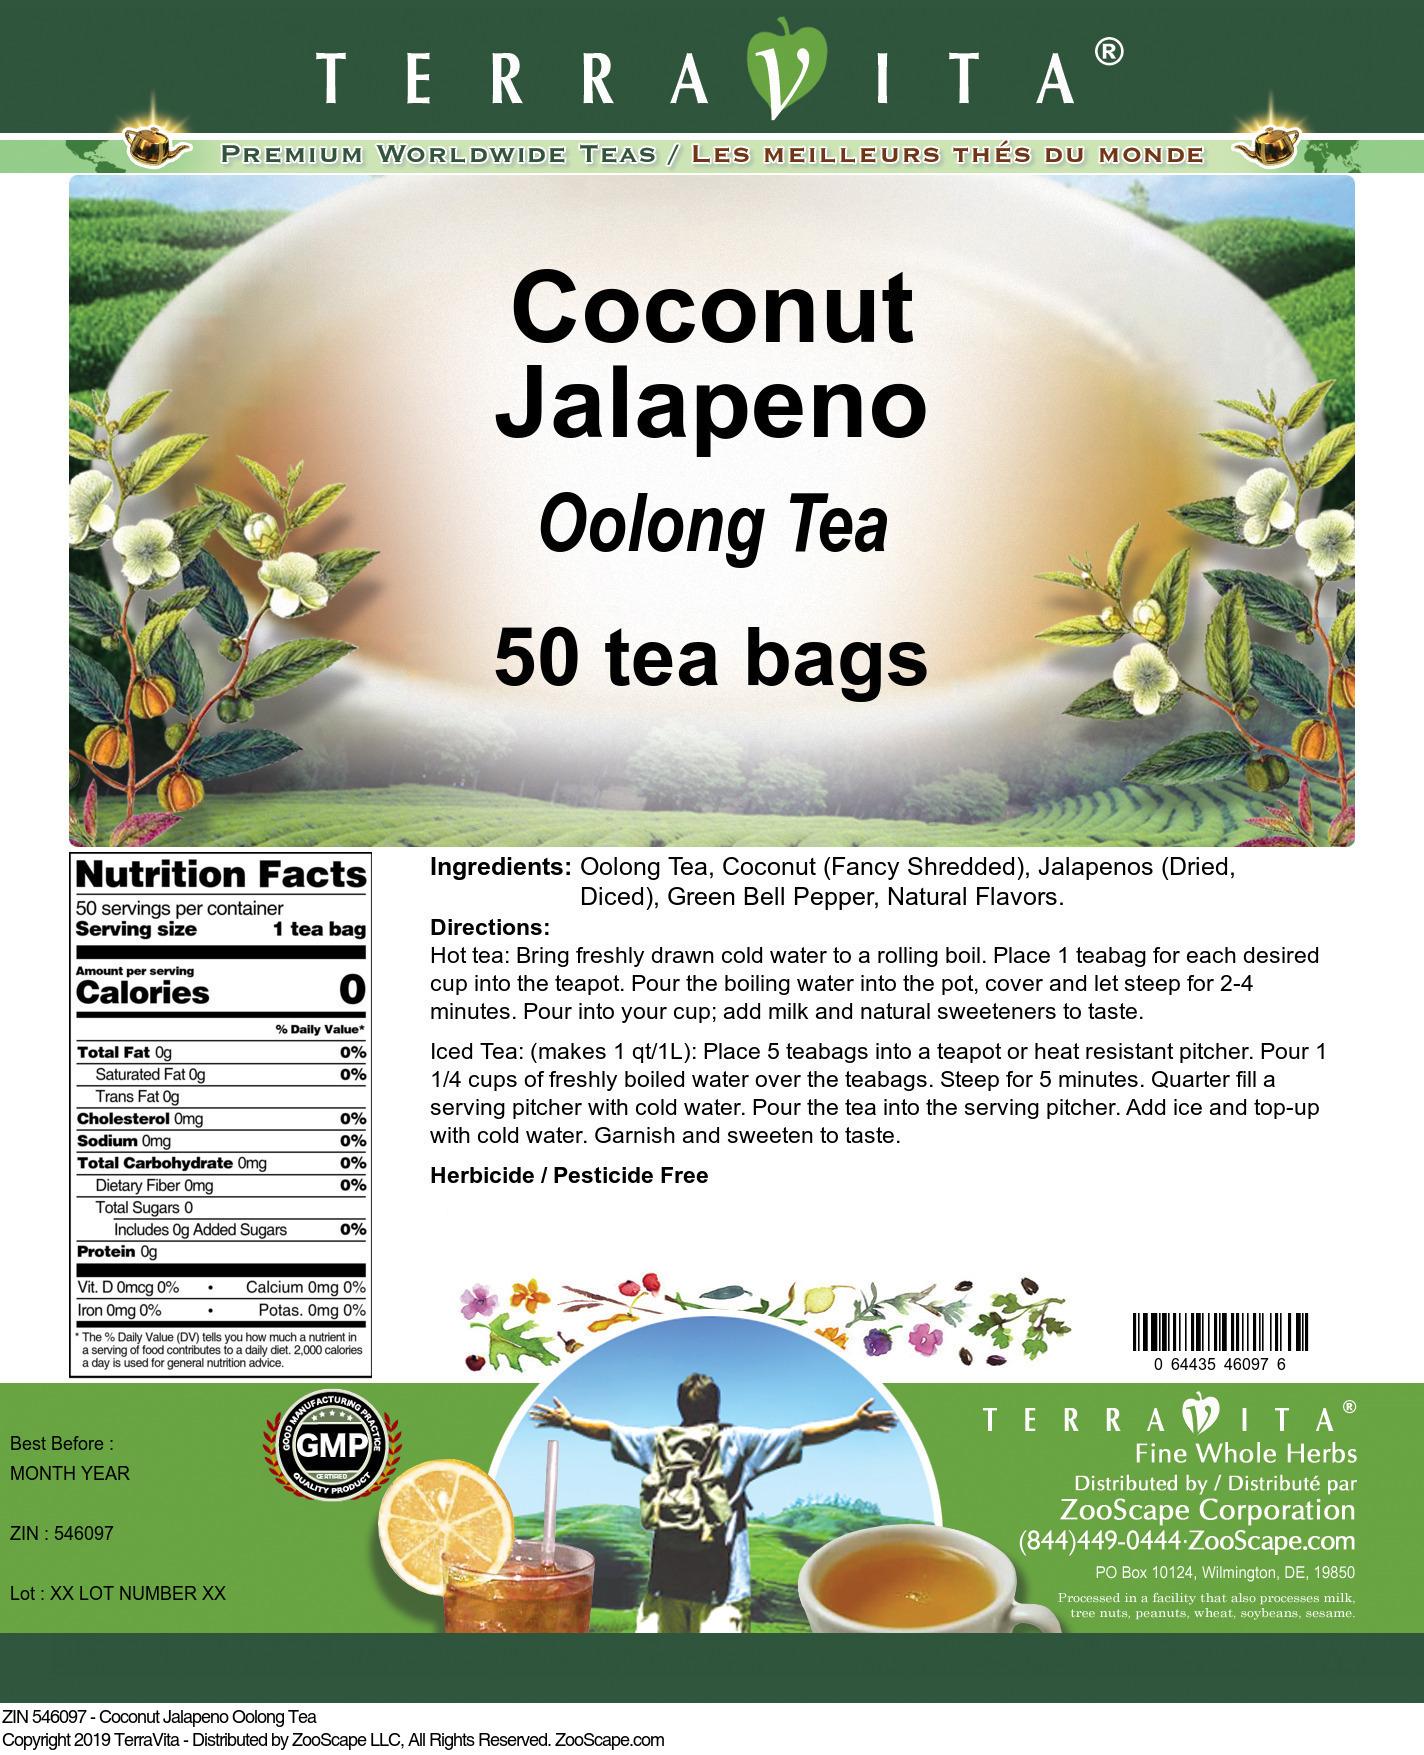 Coconut Jalapeno Oolong Tea